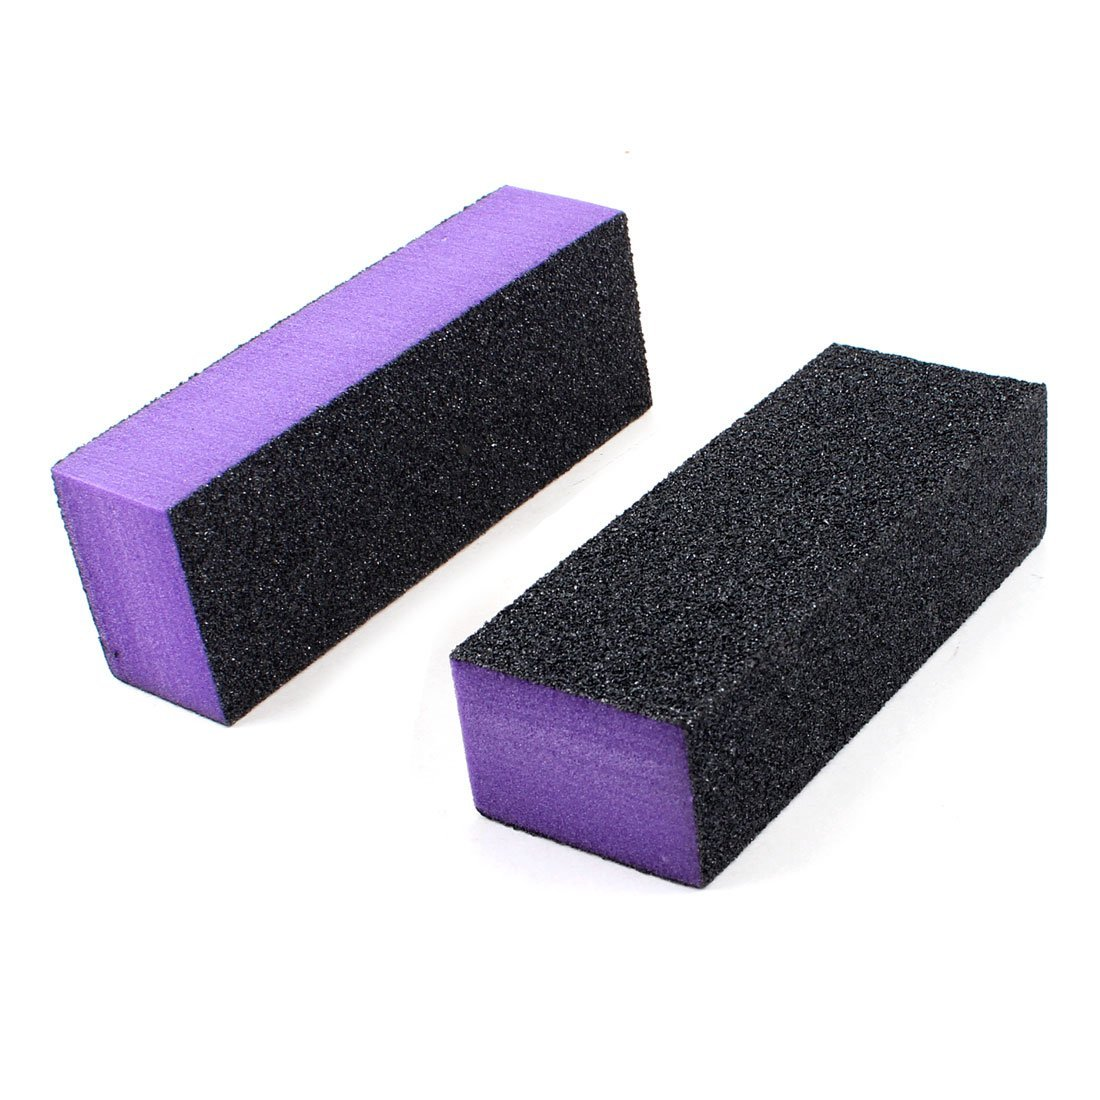 Amazon.com : Black Purple 4 Way Nail File Art Shiner Polish Buffer ...